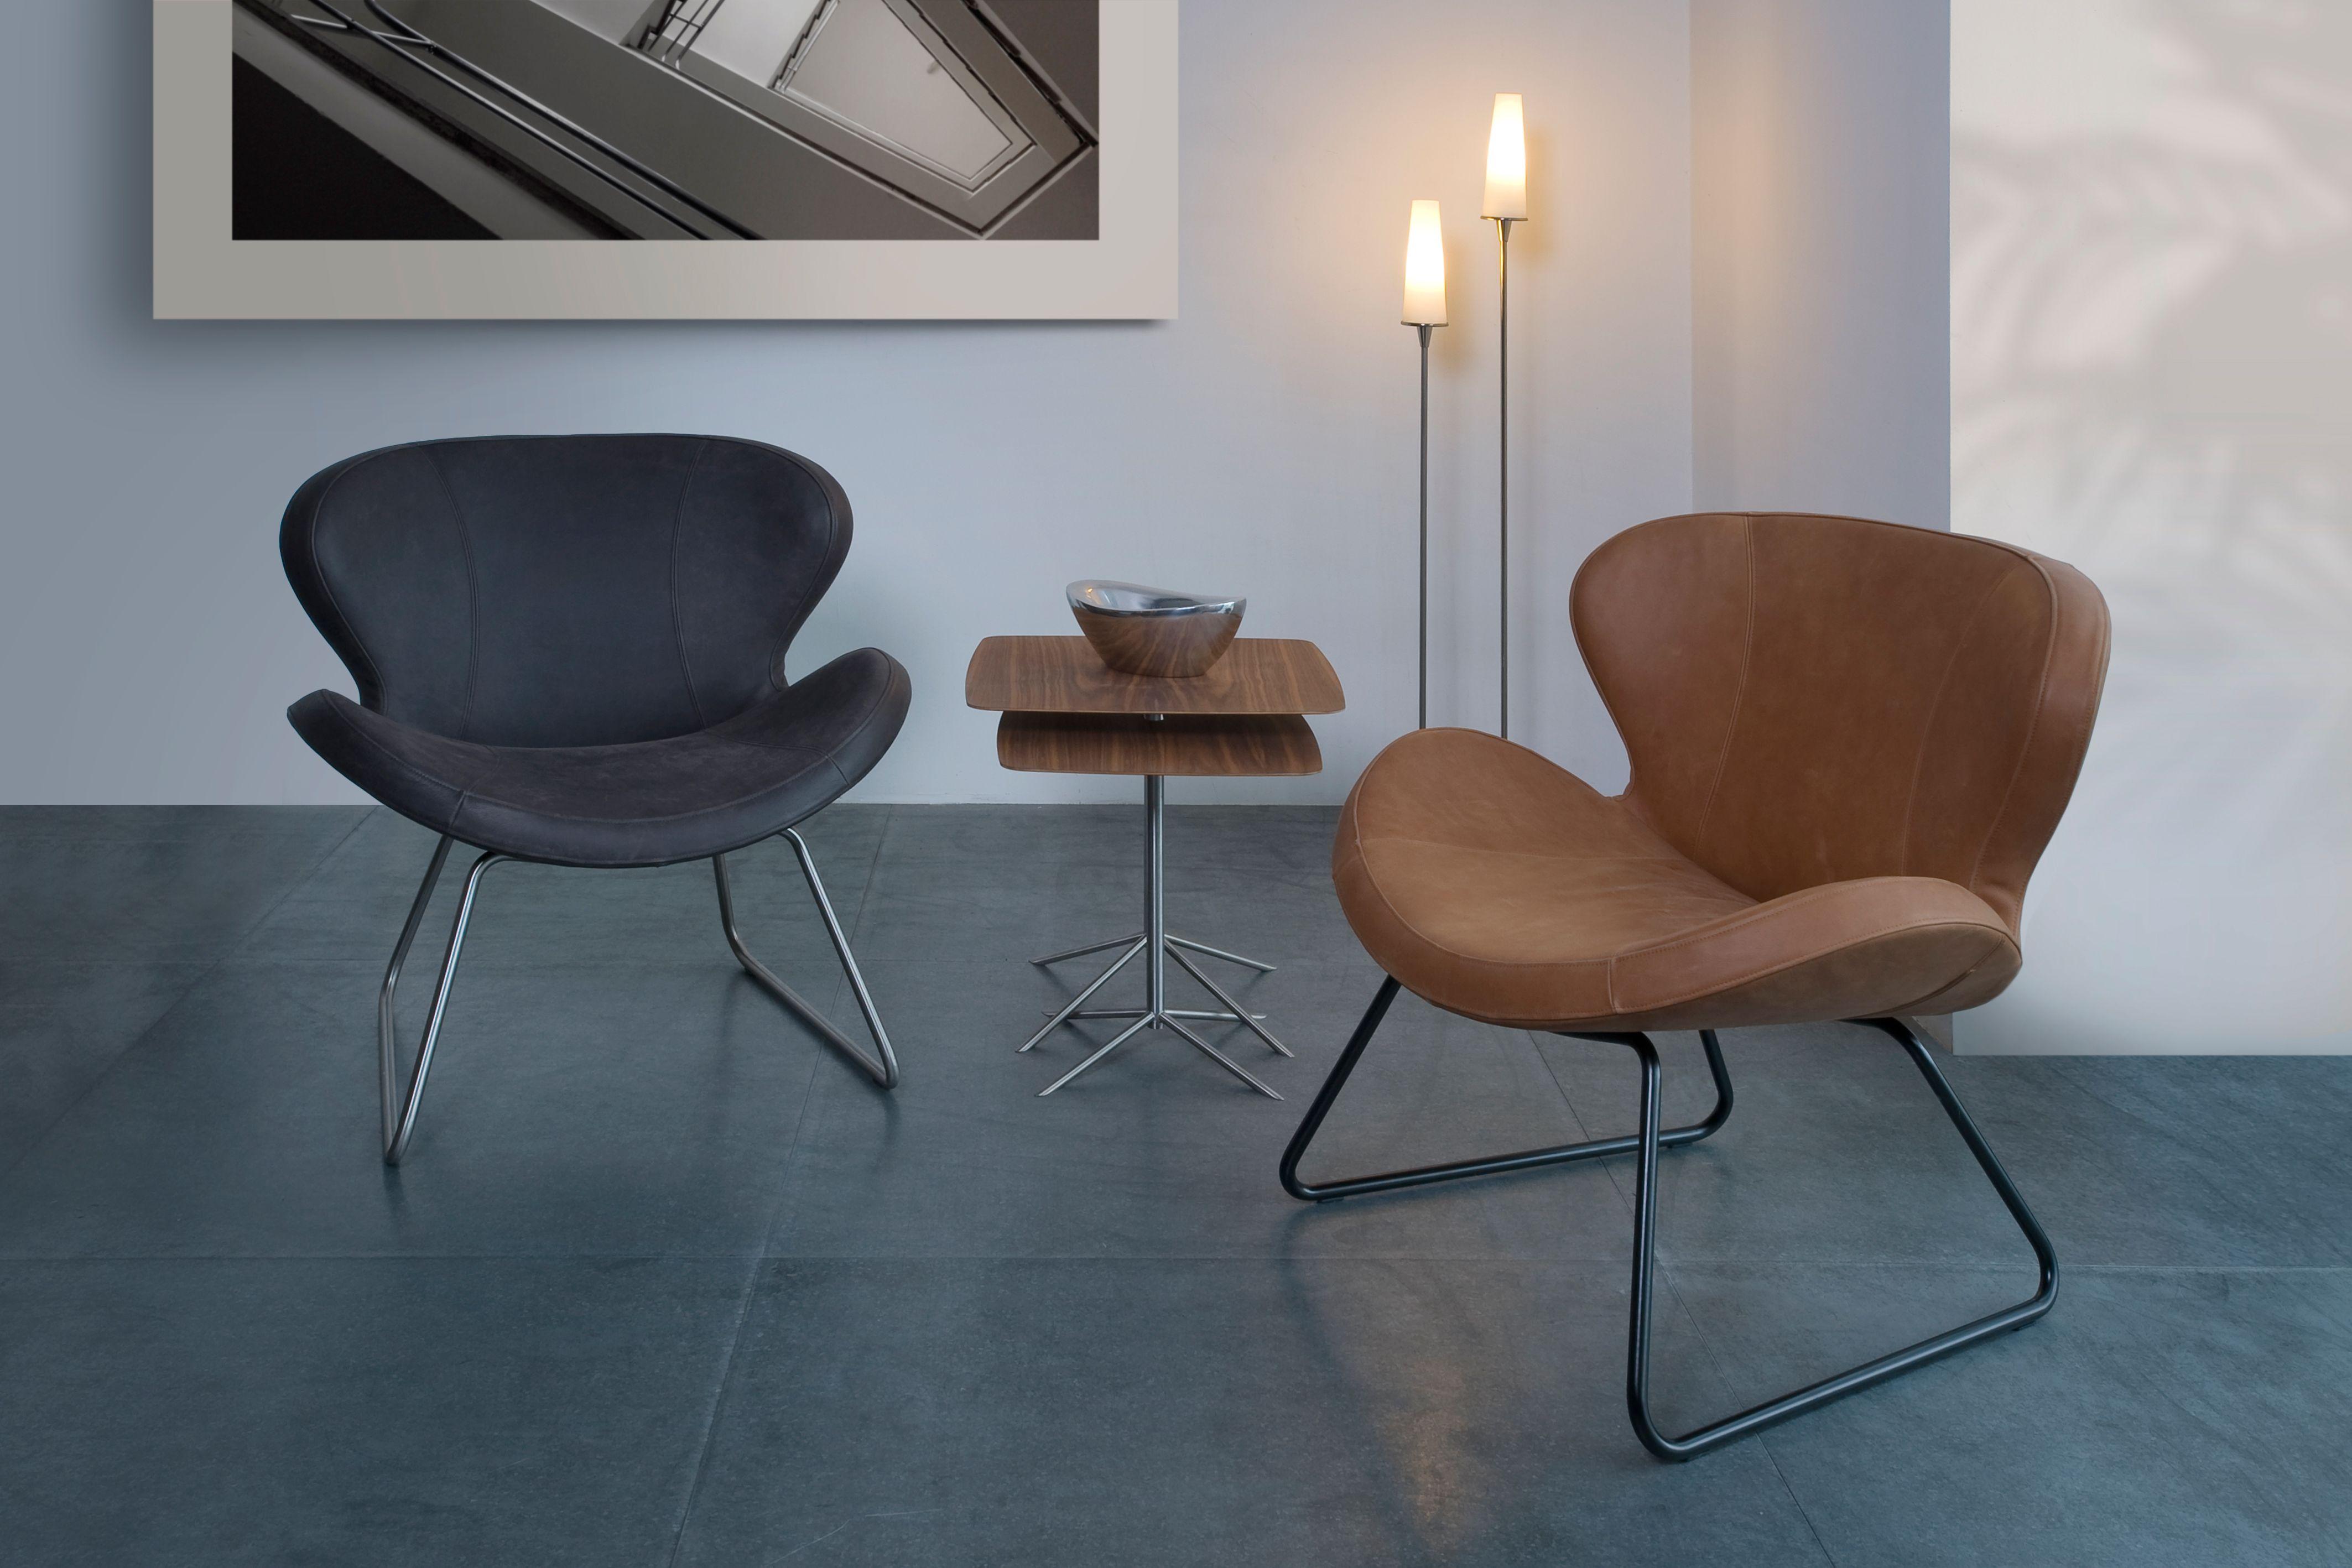 Fauteuils peggy slide bijzettafels twinset design meubels